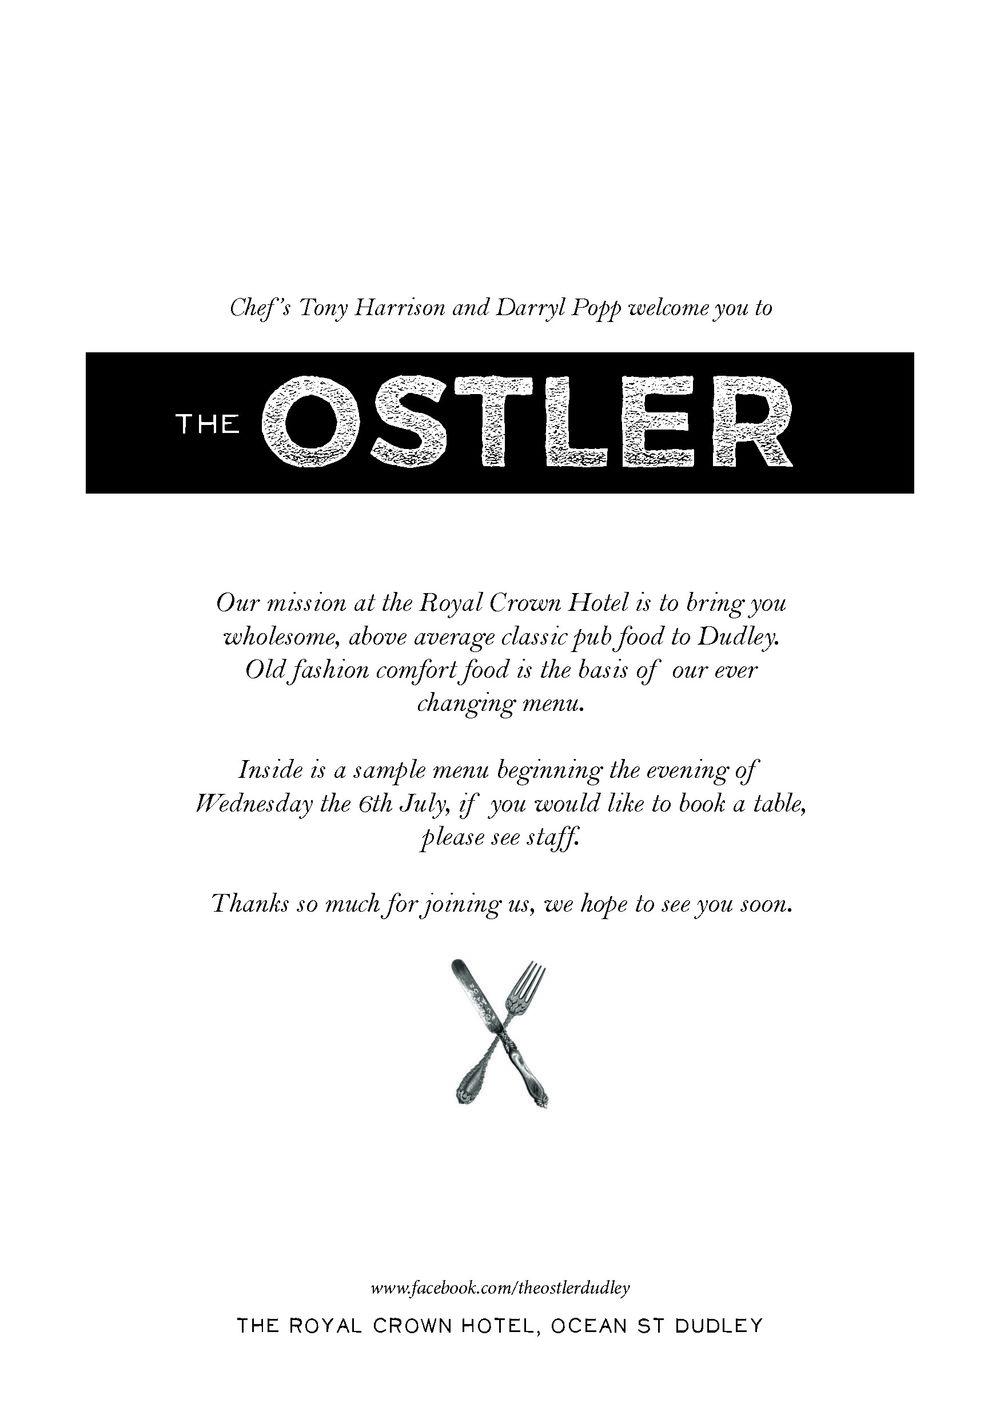 The Ostler — BISTRO LOWLANDS